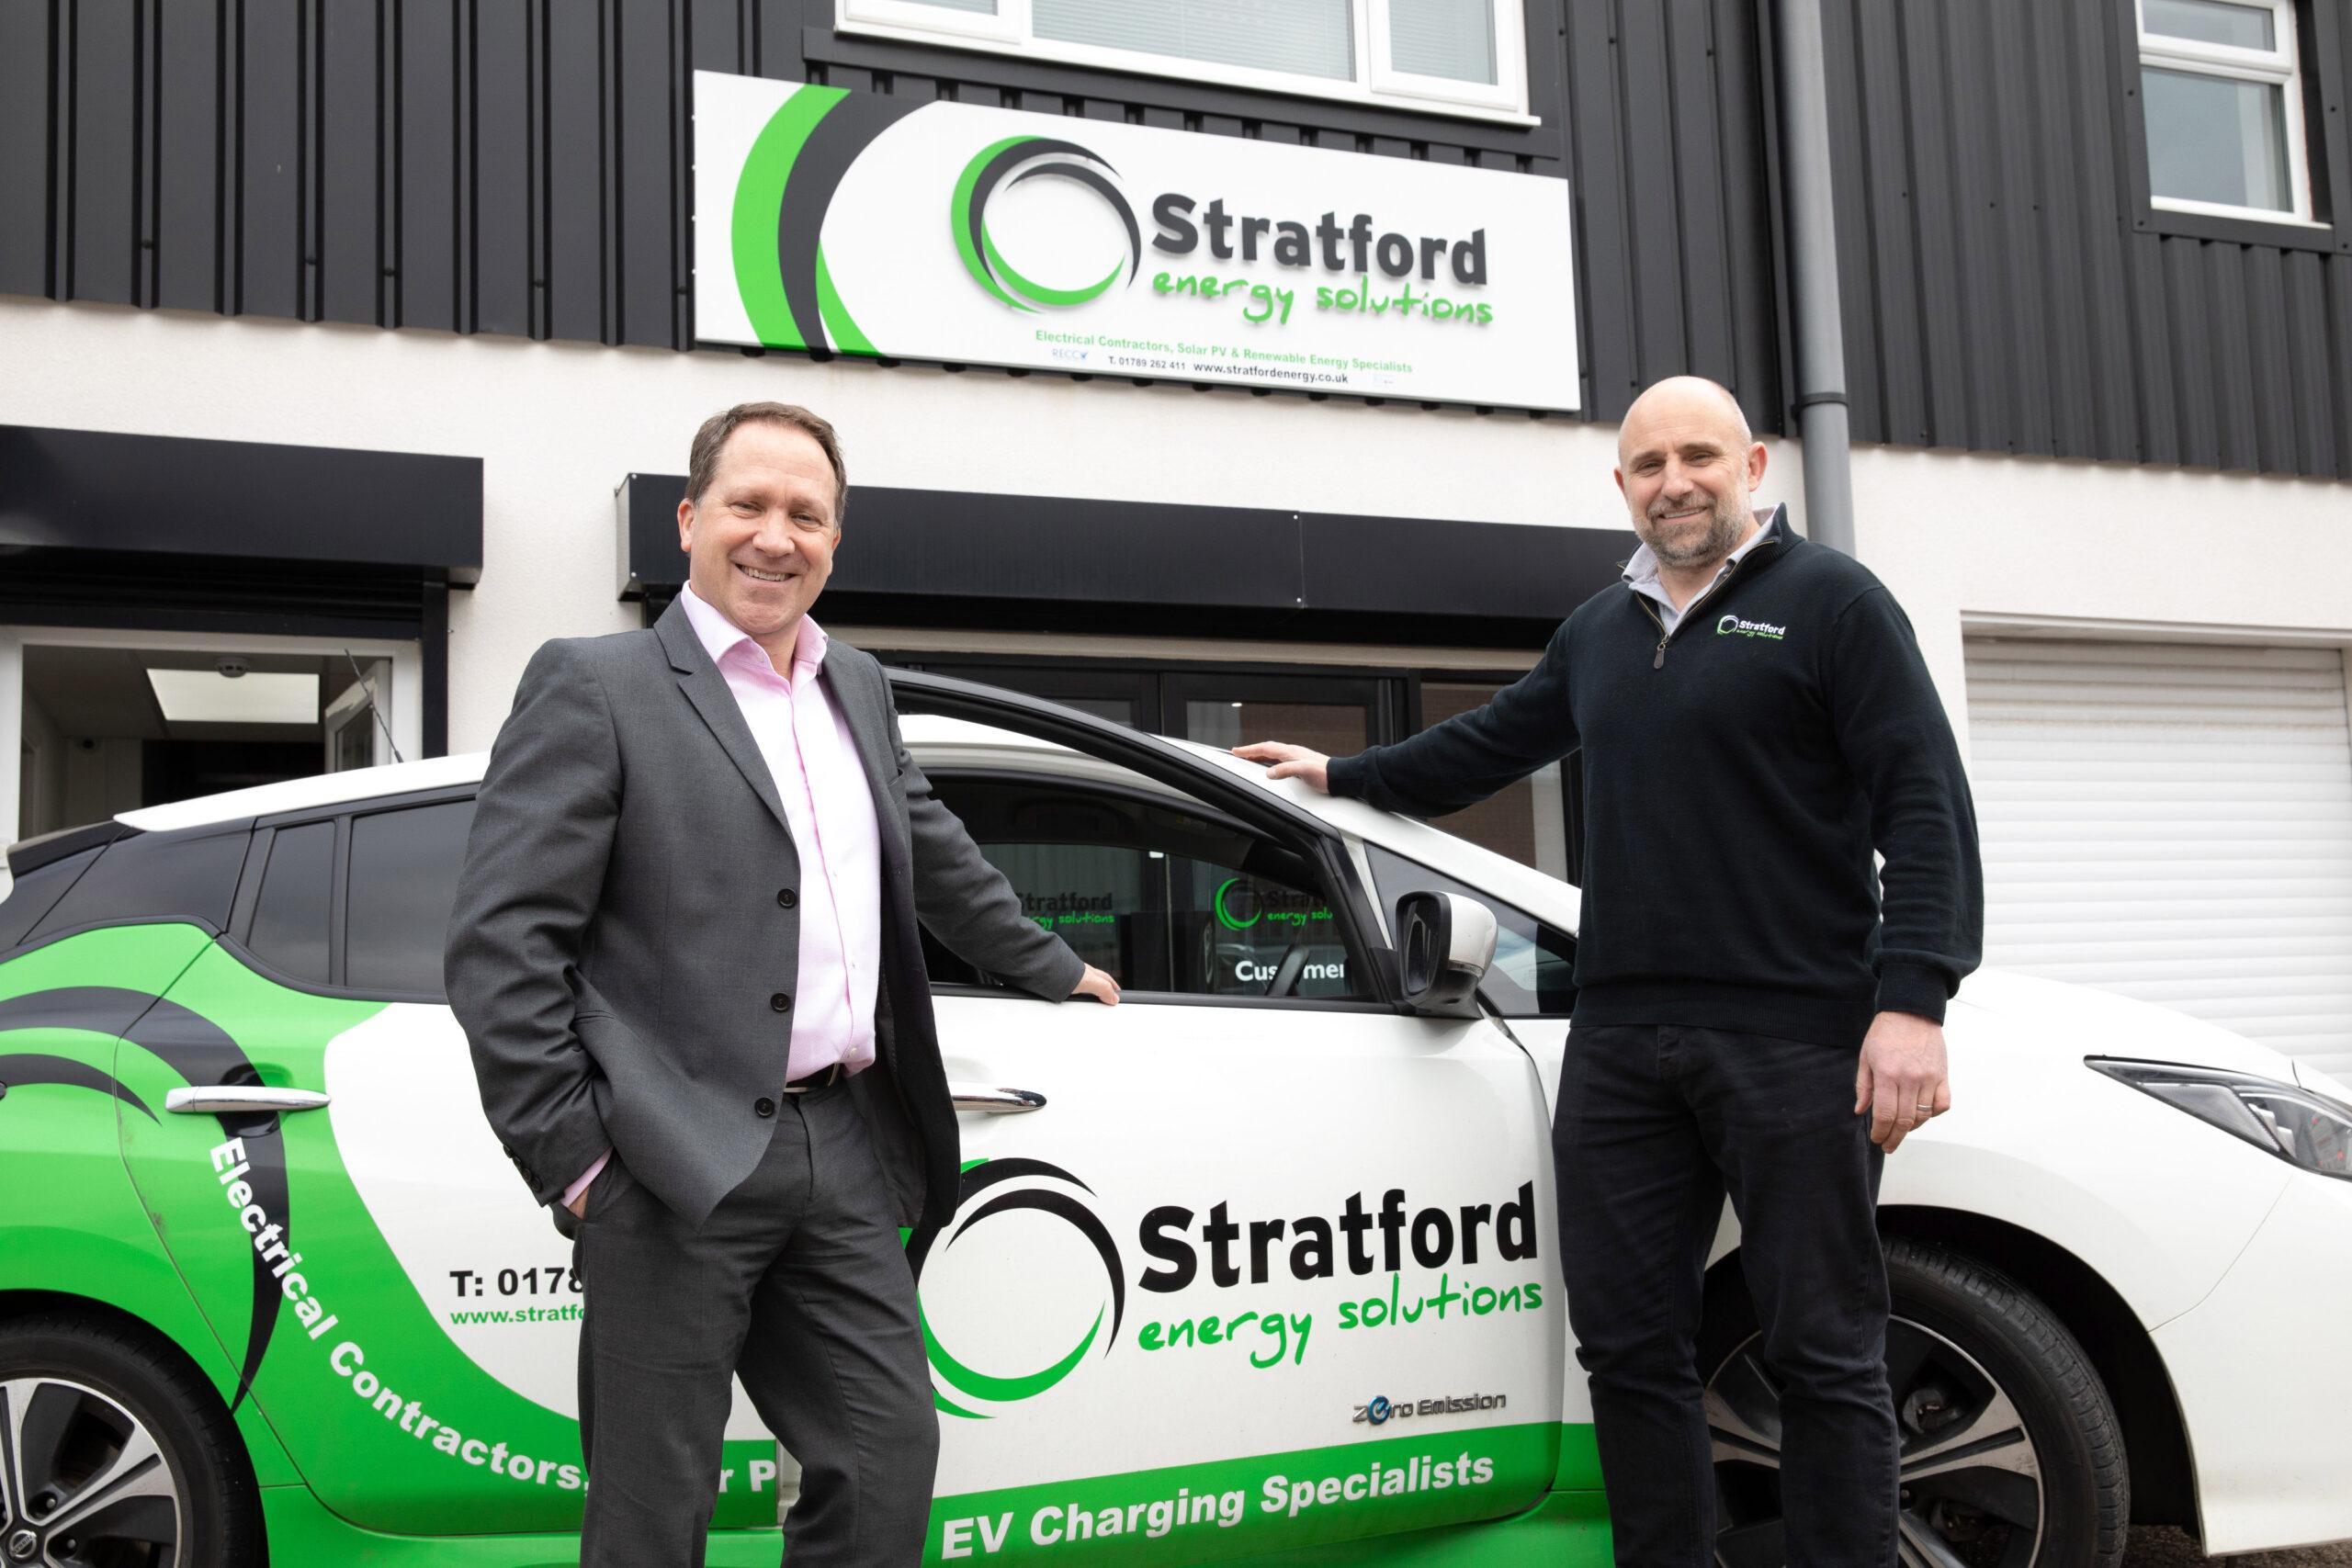 Stratford accountancy practice helps solar PV company enjoy record lockdown sales